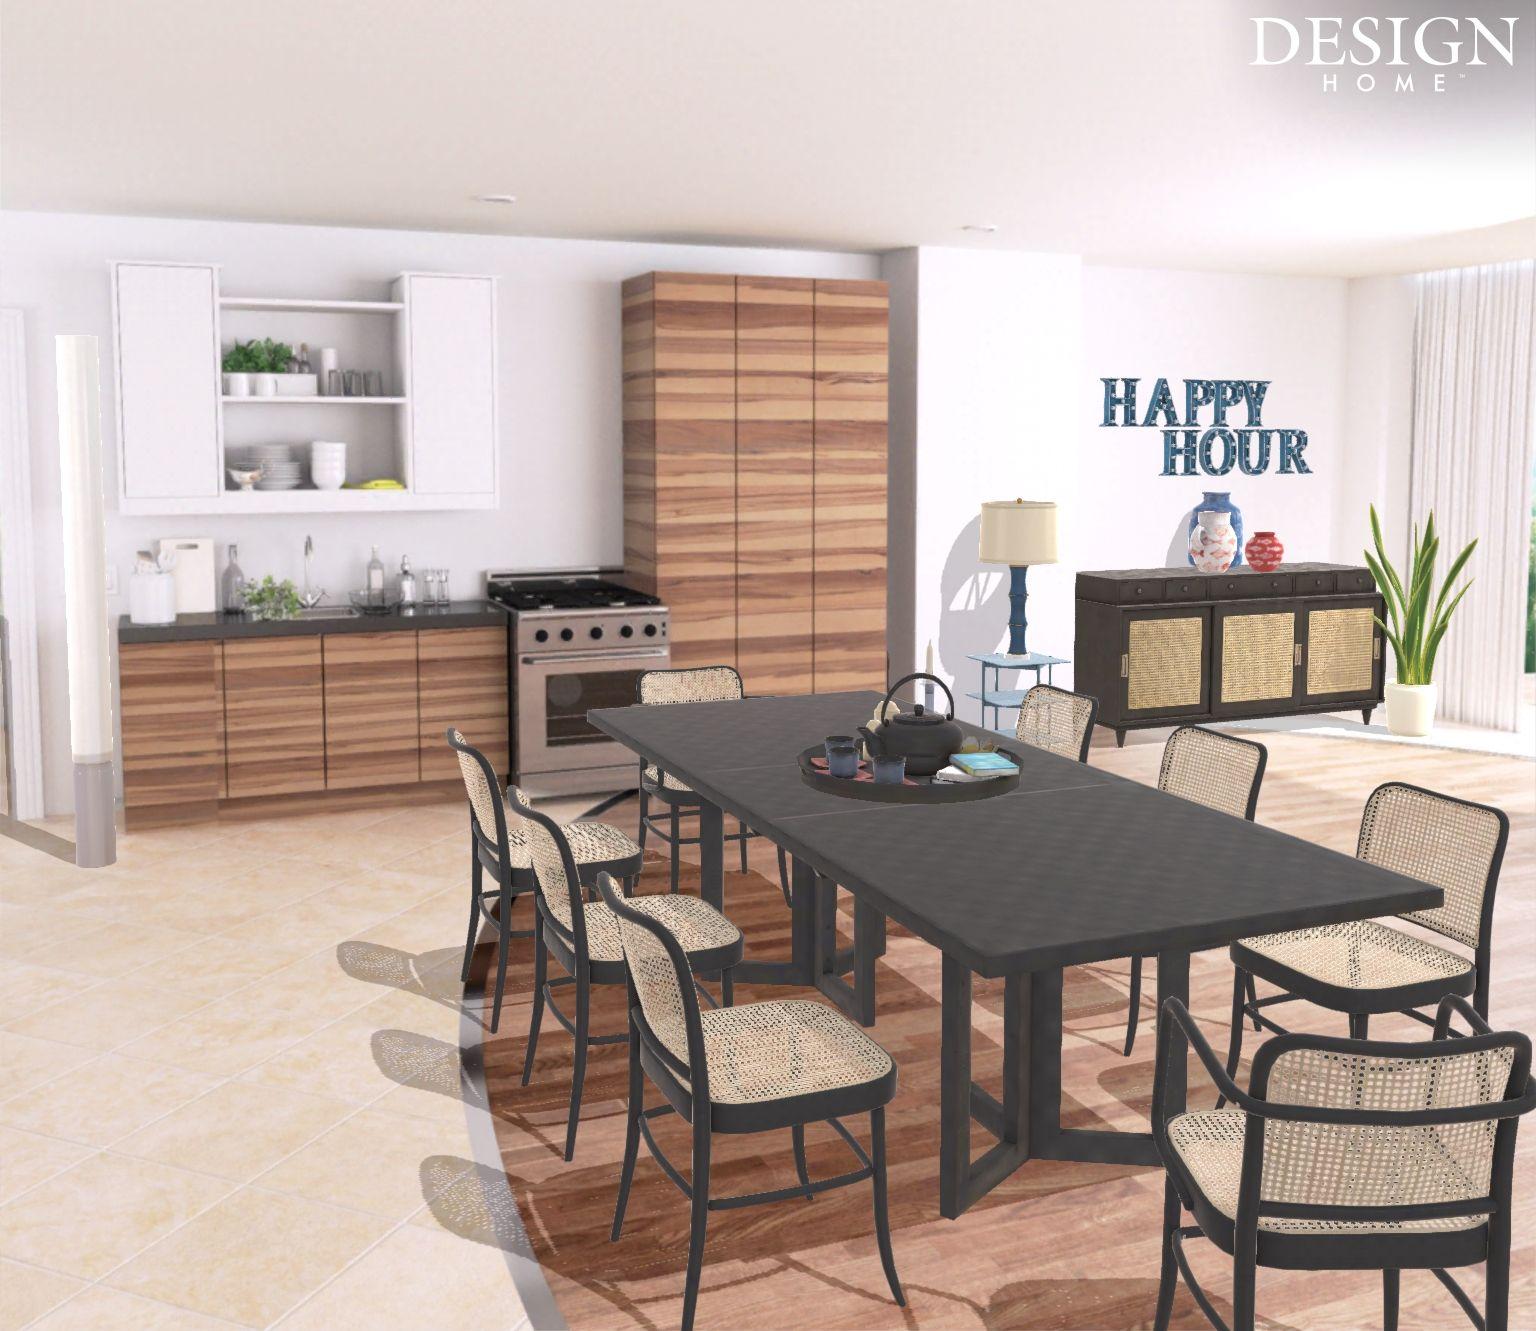 House rooms app design application design